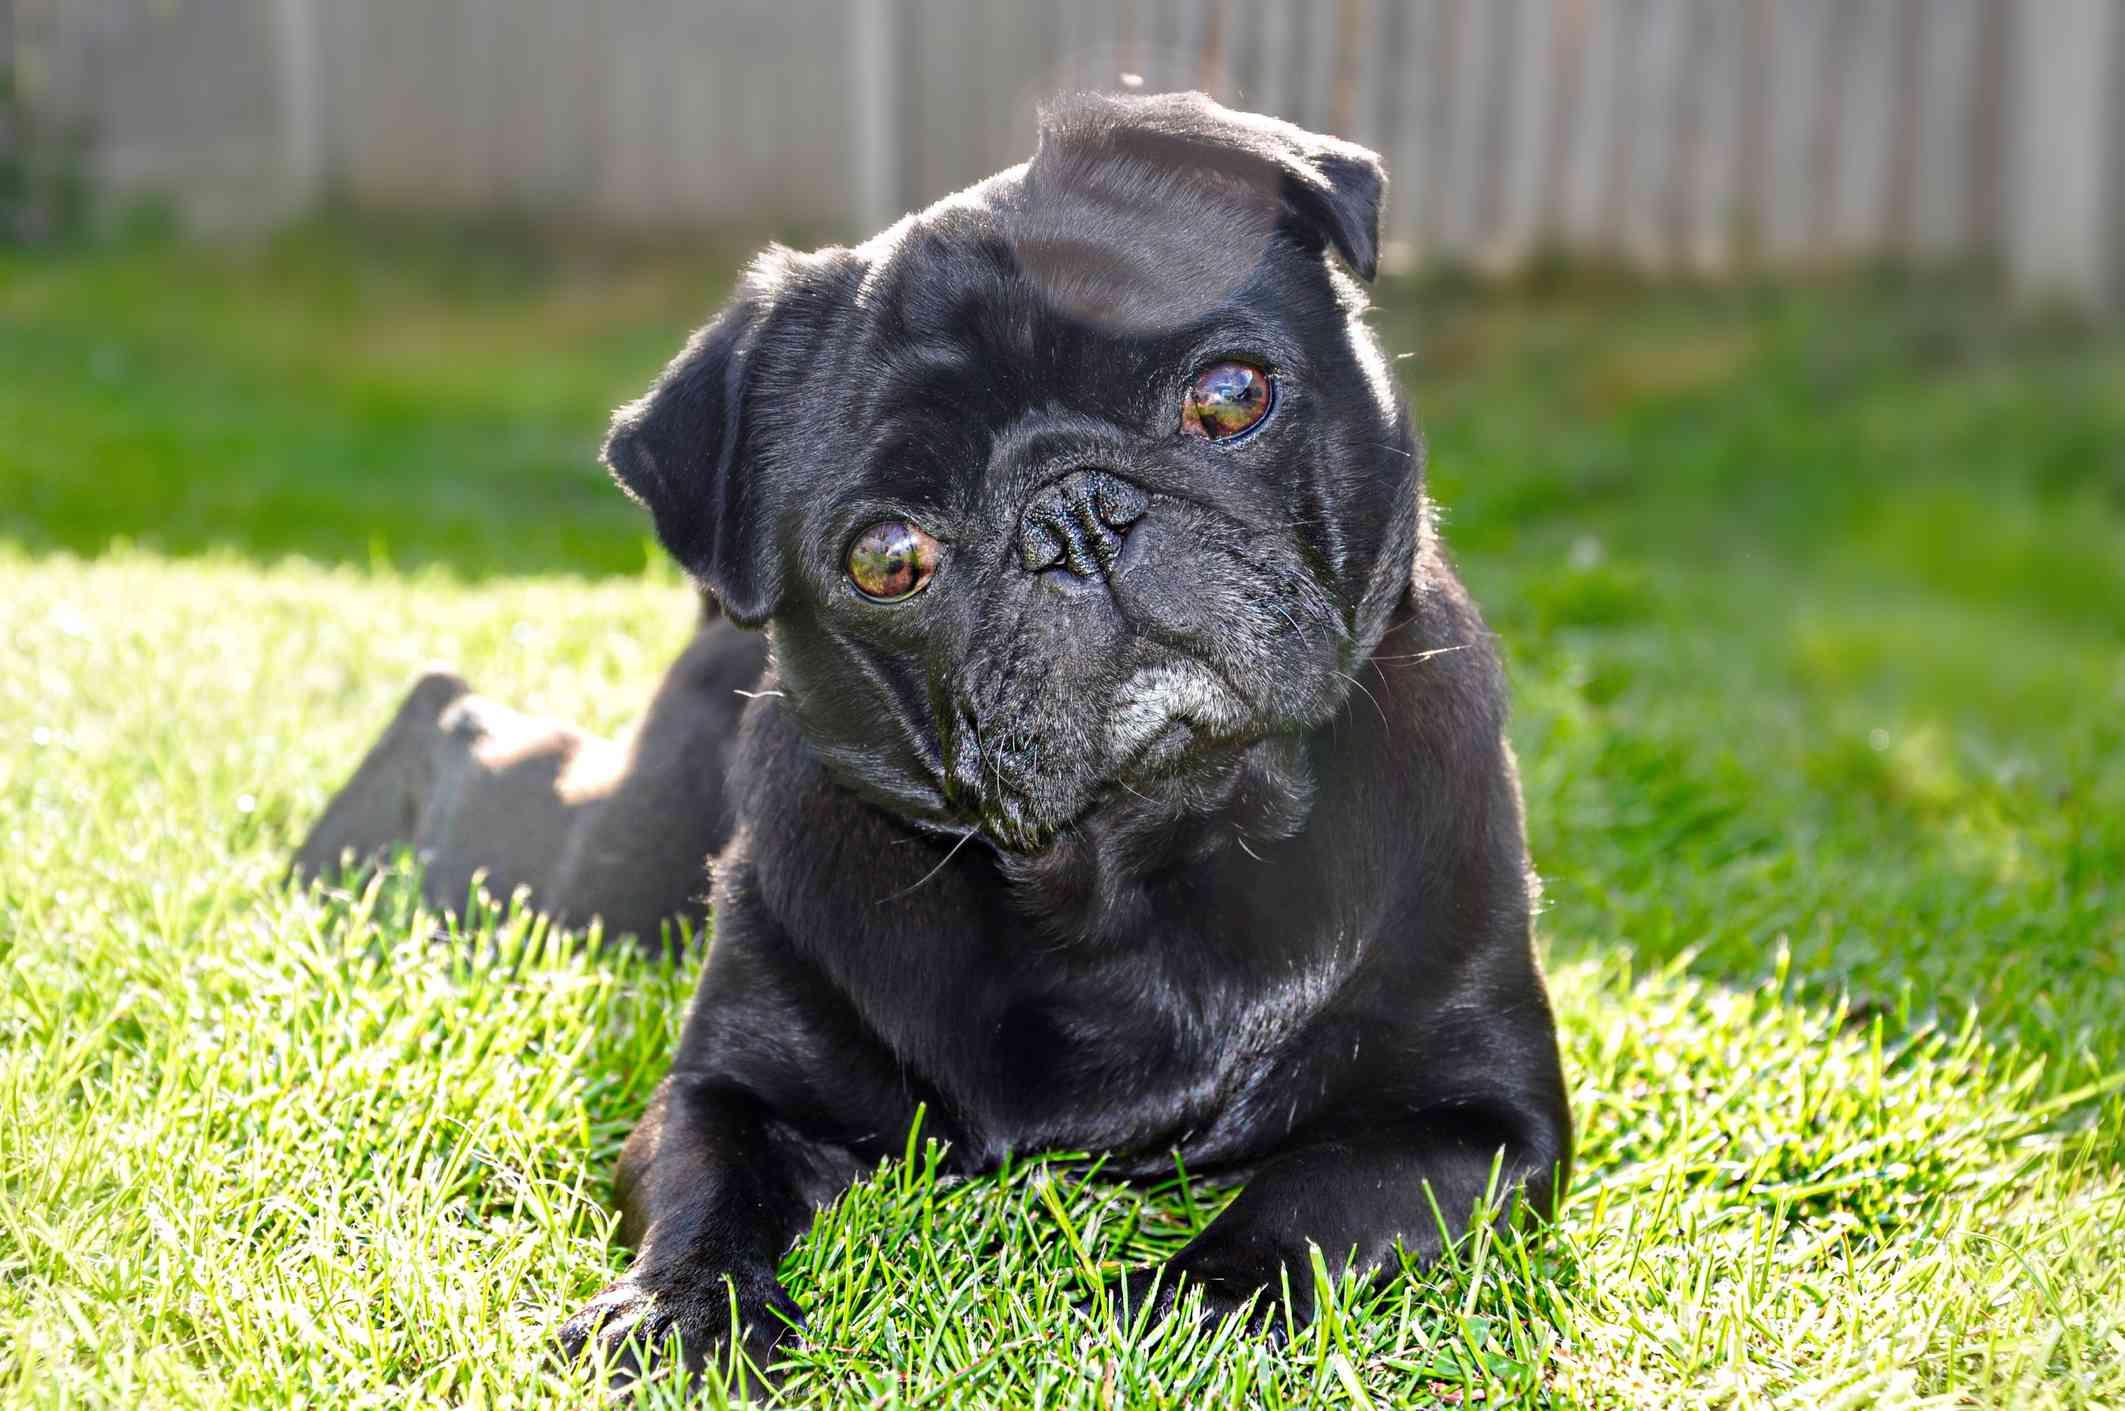 Black pug on grass